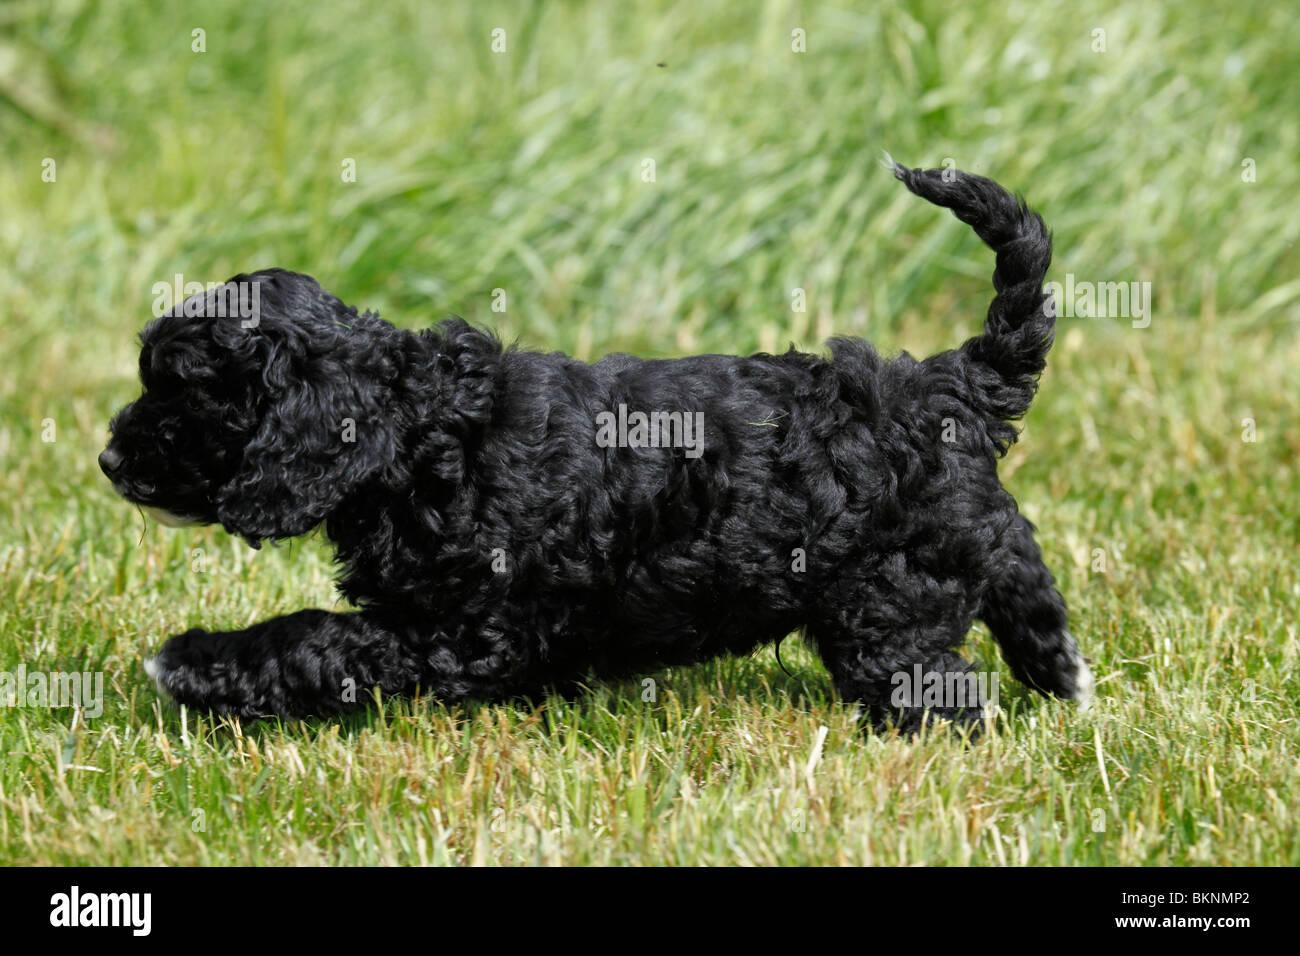 Cockapoo Welpe / Cockapoo puppy - Stock Image